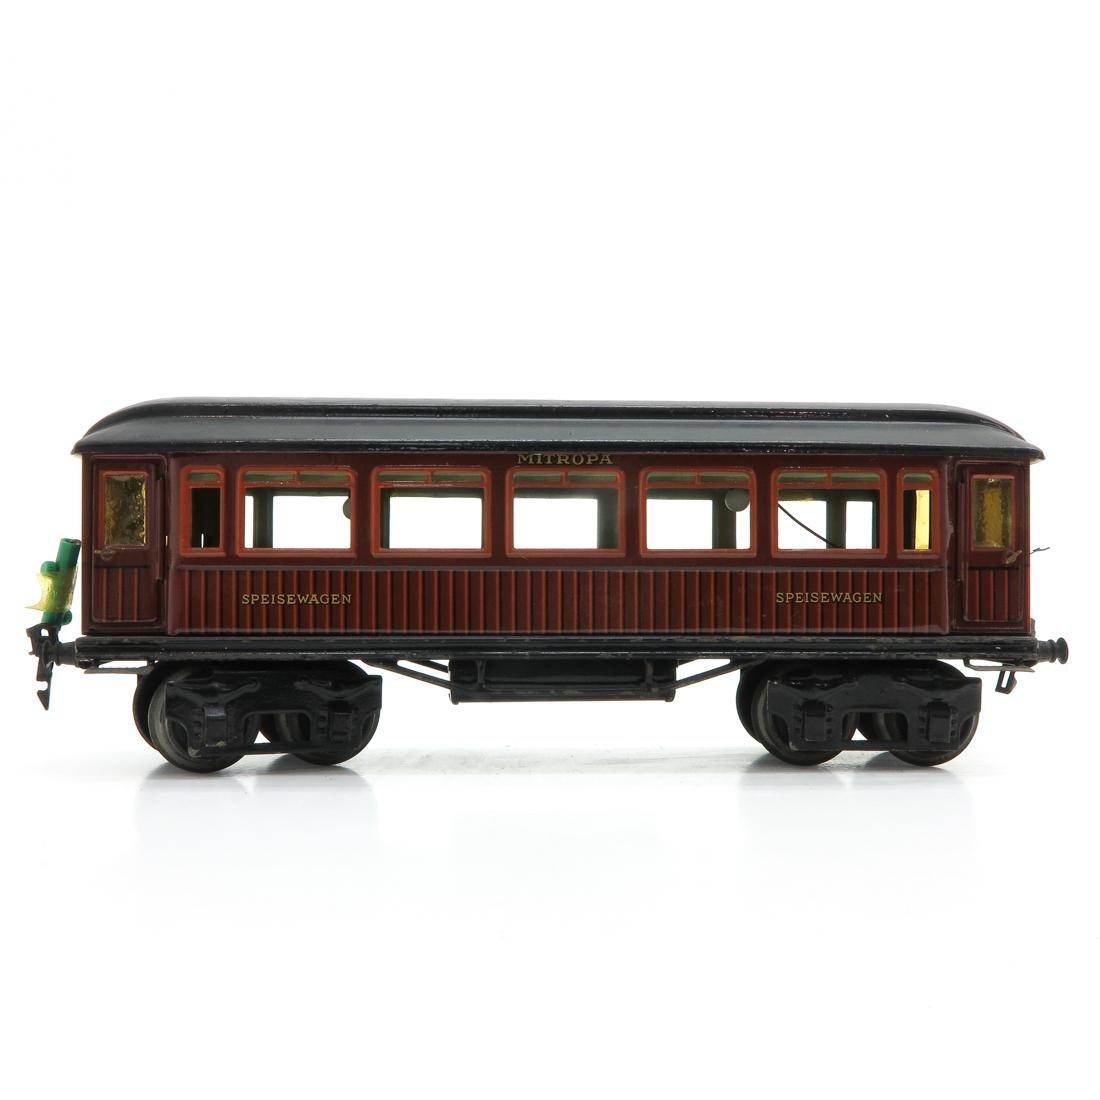 Vintage Marklin Speisewagon Passenger Car